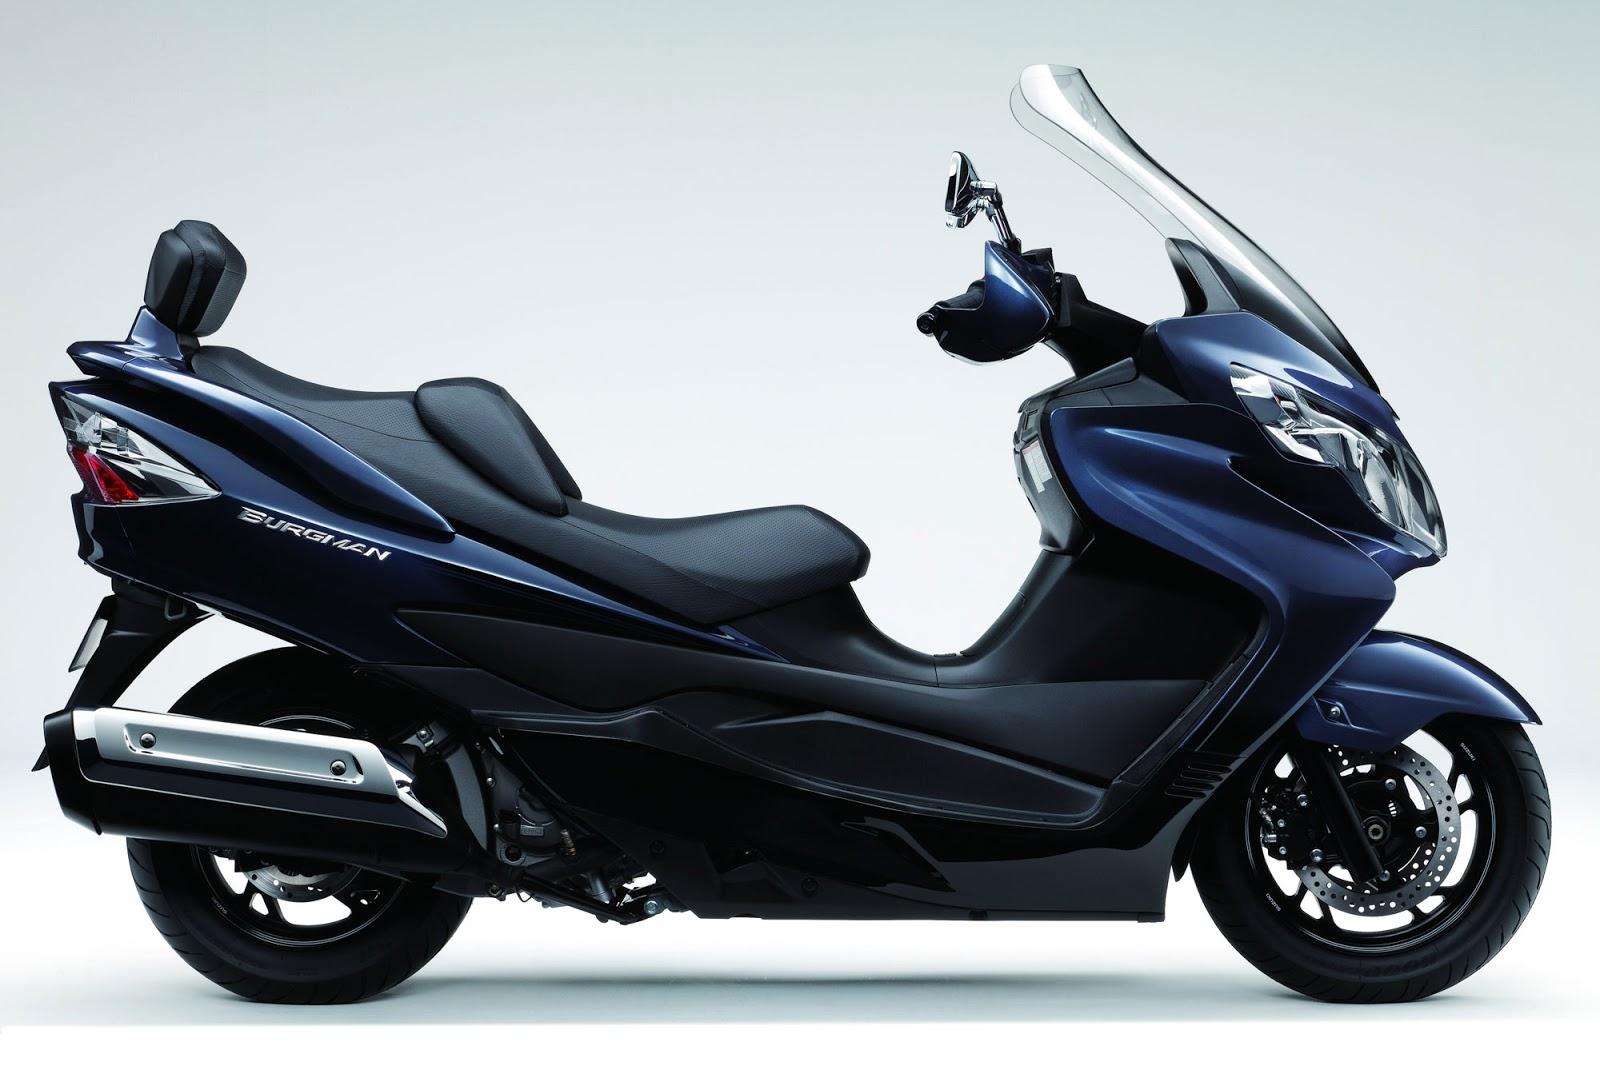 latest motorbike 2013 suzuki burgman 400 abs review. Black Bedroom Furniture Sets. Home Design Ideas